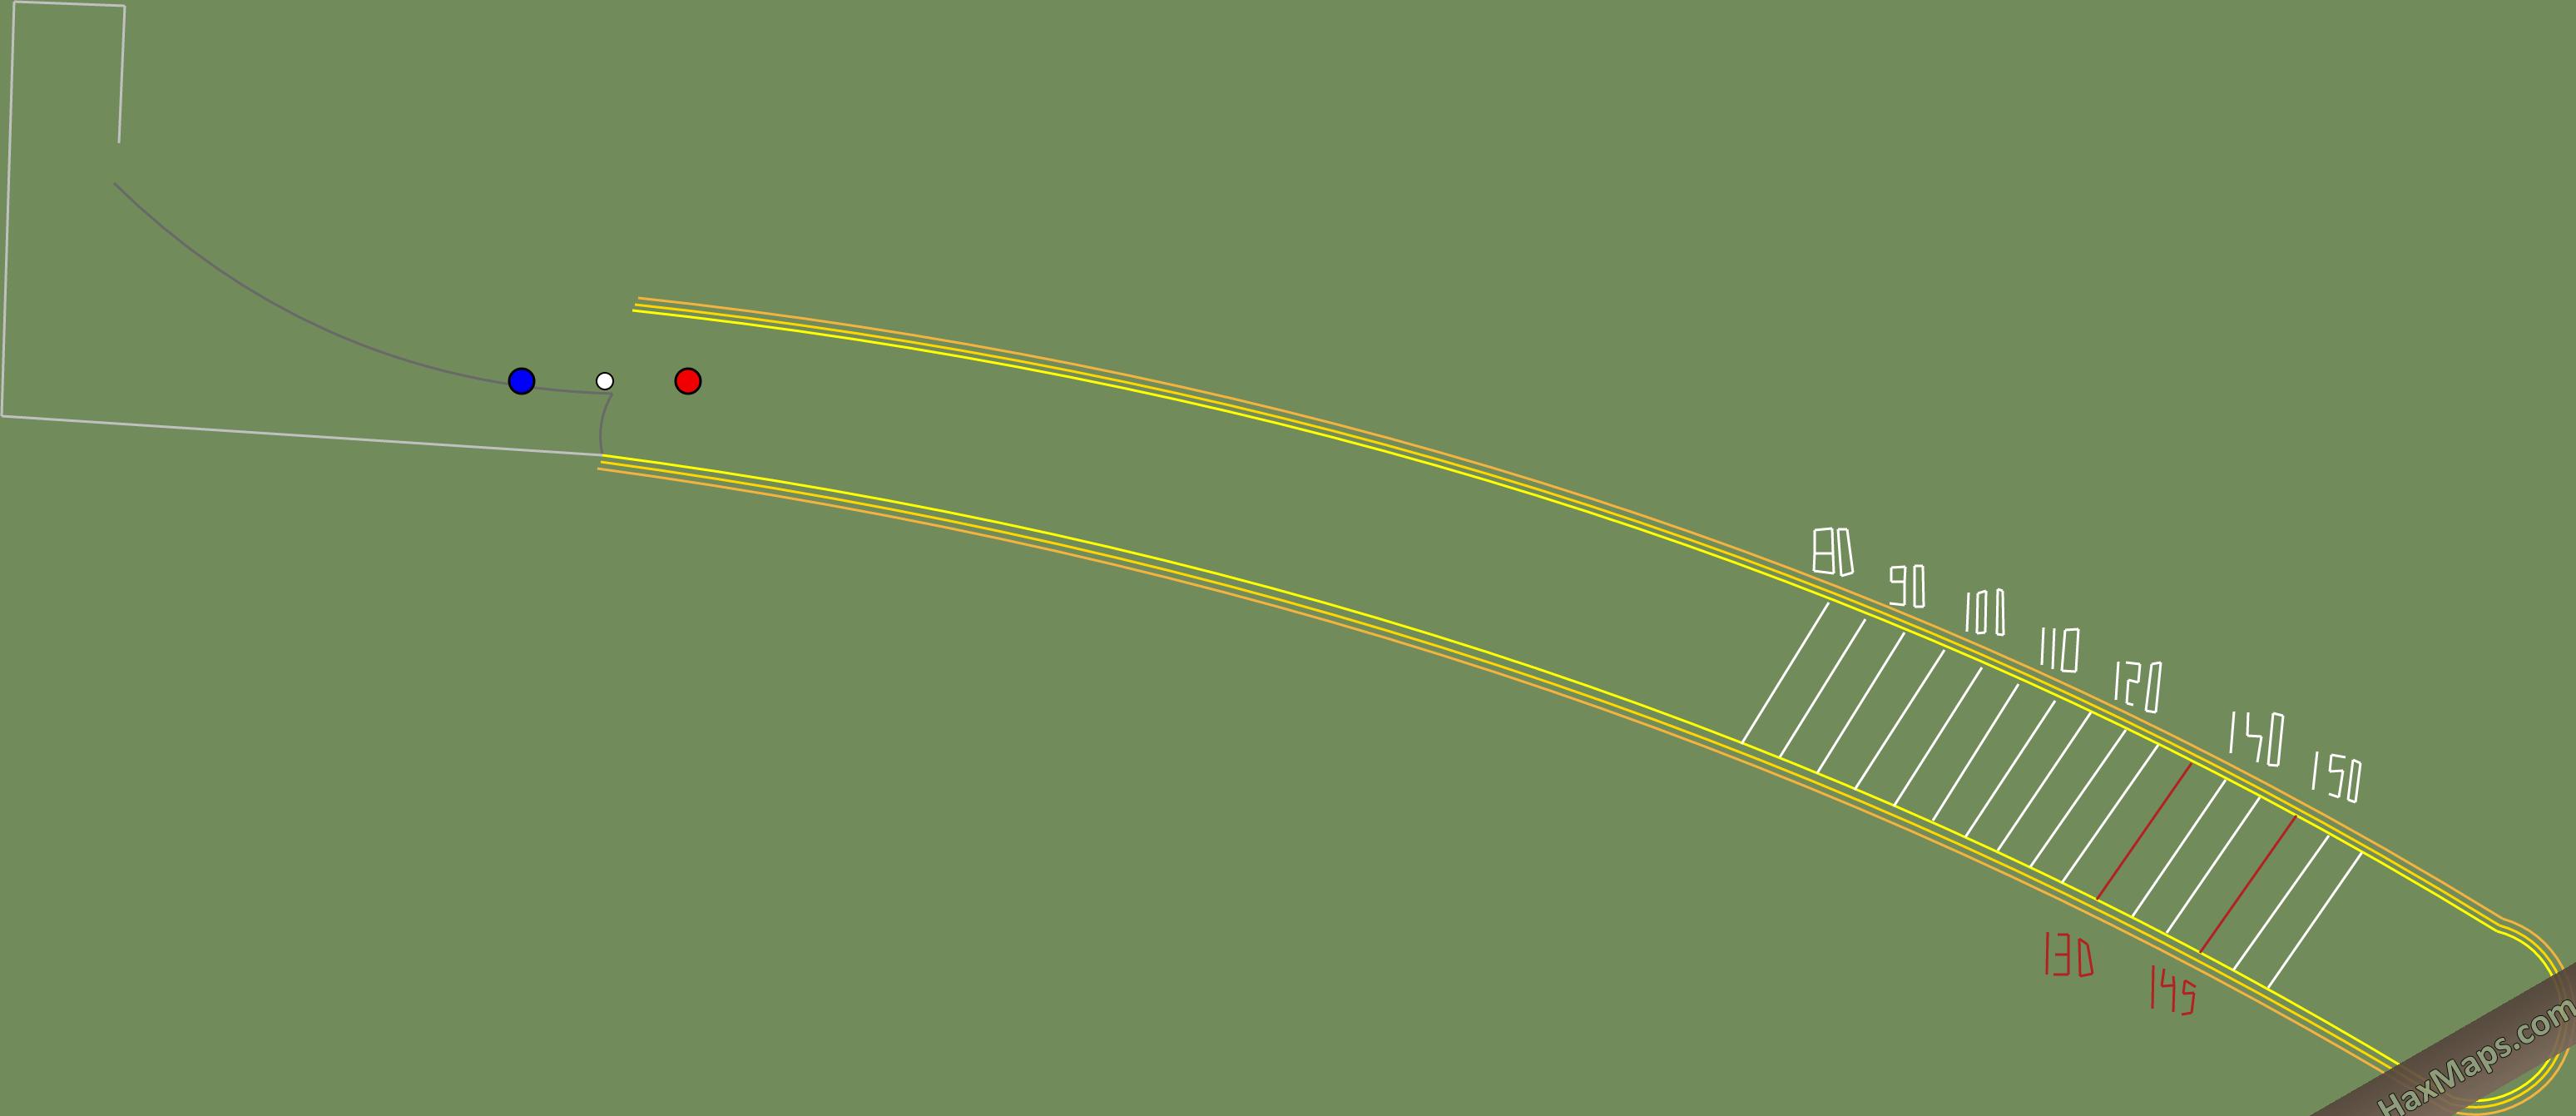 hax ball maps | Willingen HS 145 by Wyspy